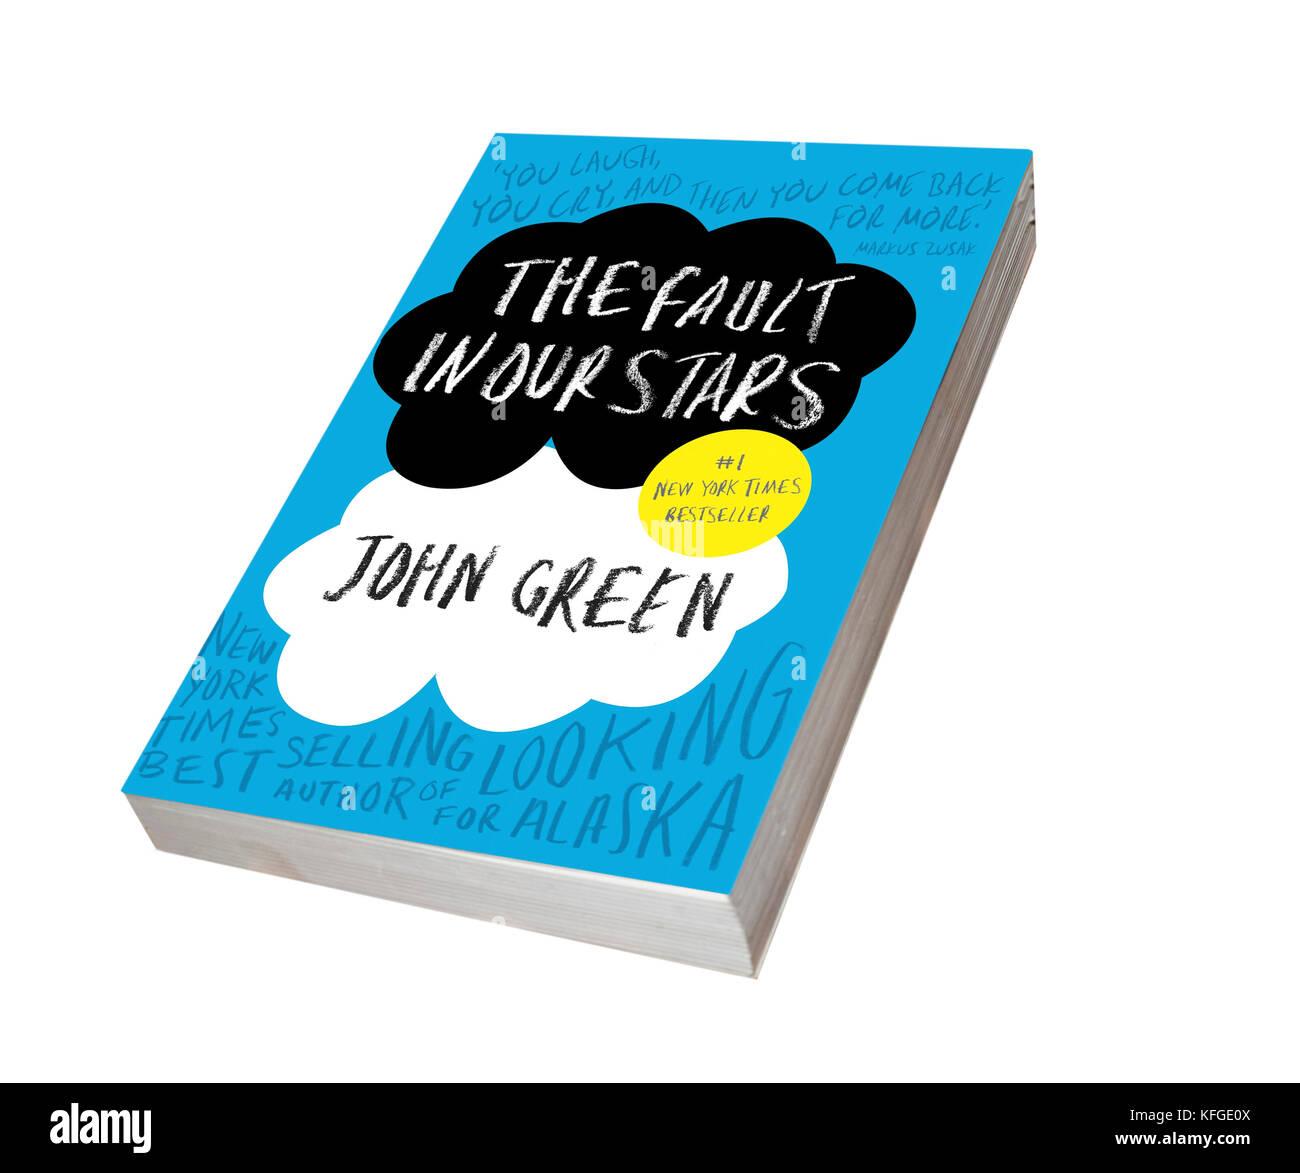 Défaut dans nos étoiles - livre de John Green Photo Stock